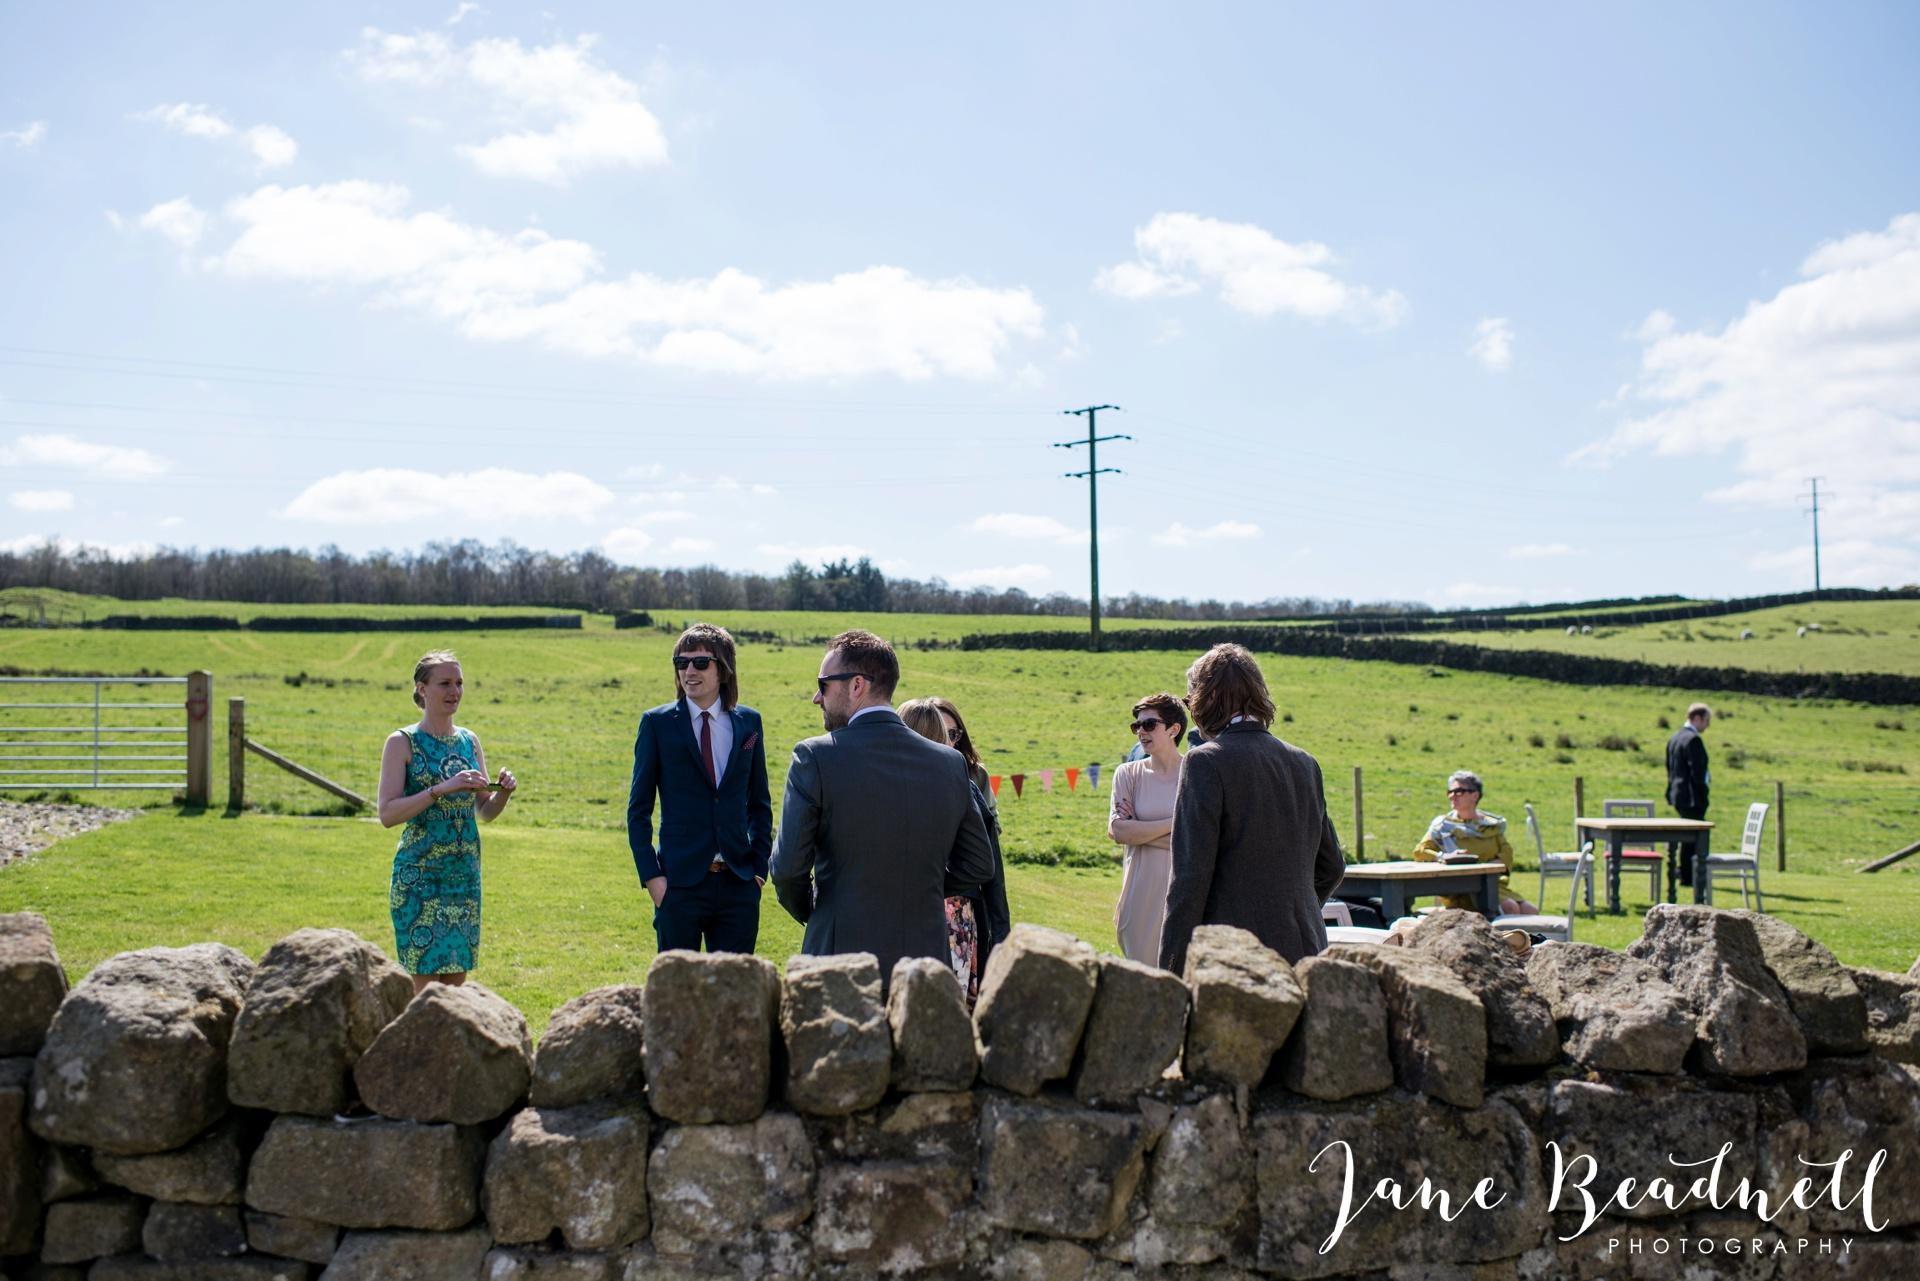 Jane Beadnell fine art wedding photographer The Cheerful Chilli Barn Otley_0001